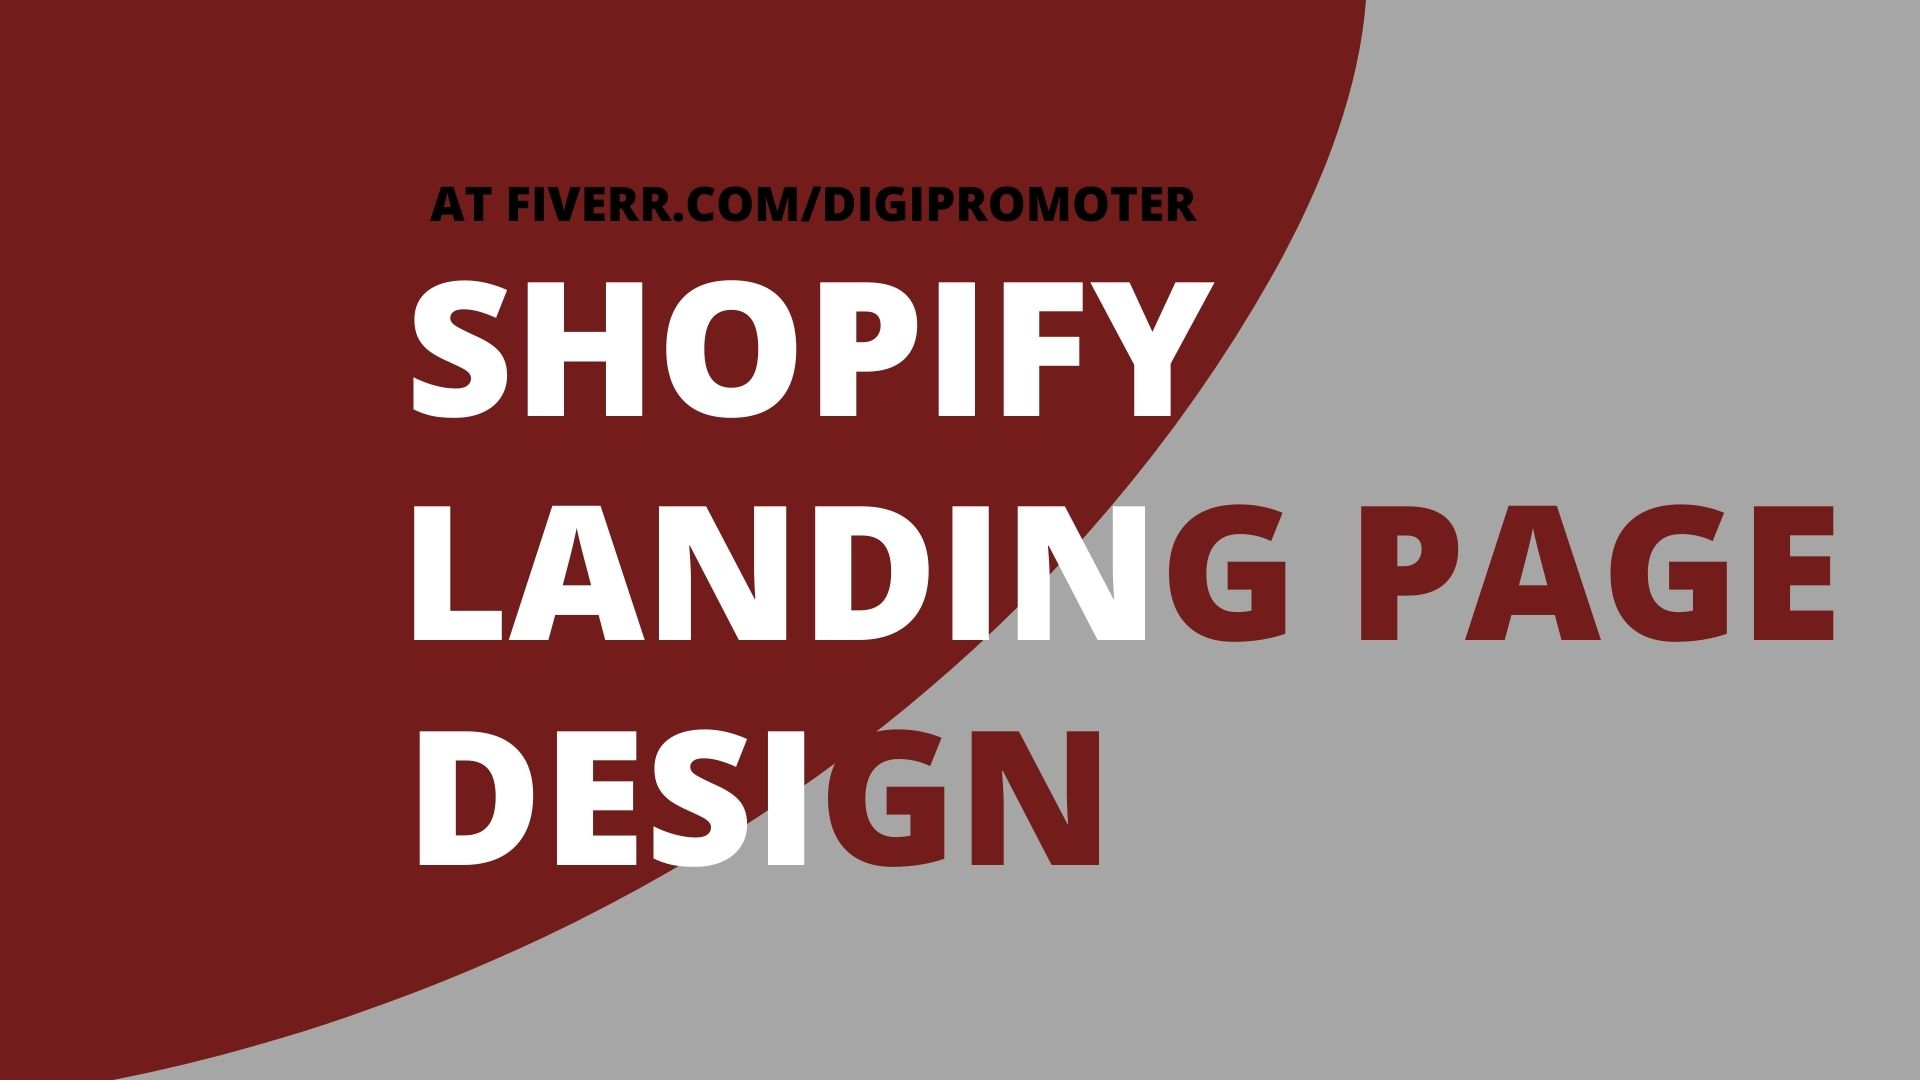 I will design shopify landing page samcart wix hubspot clickfunnels landing page, FiverrBox